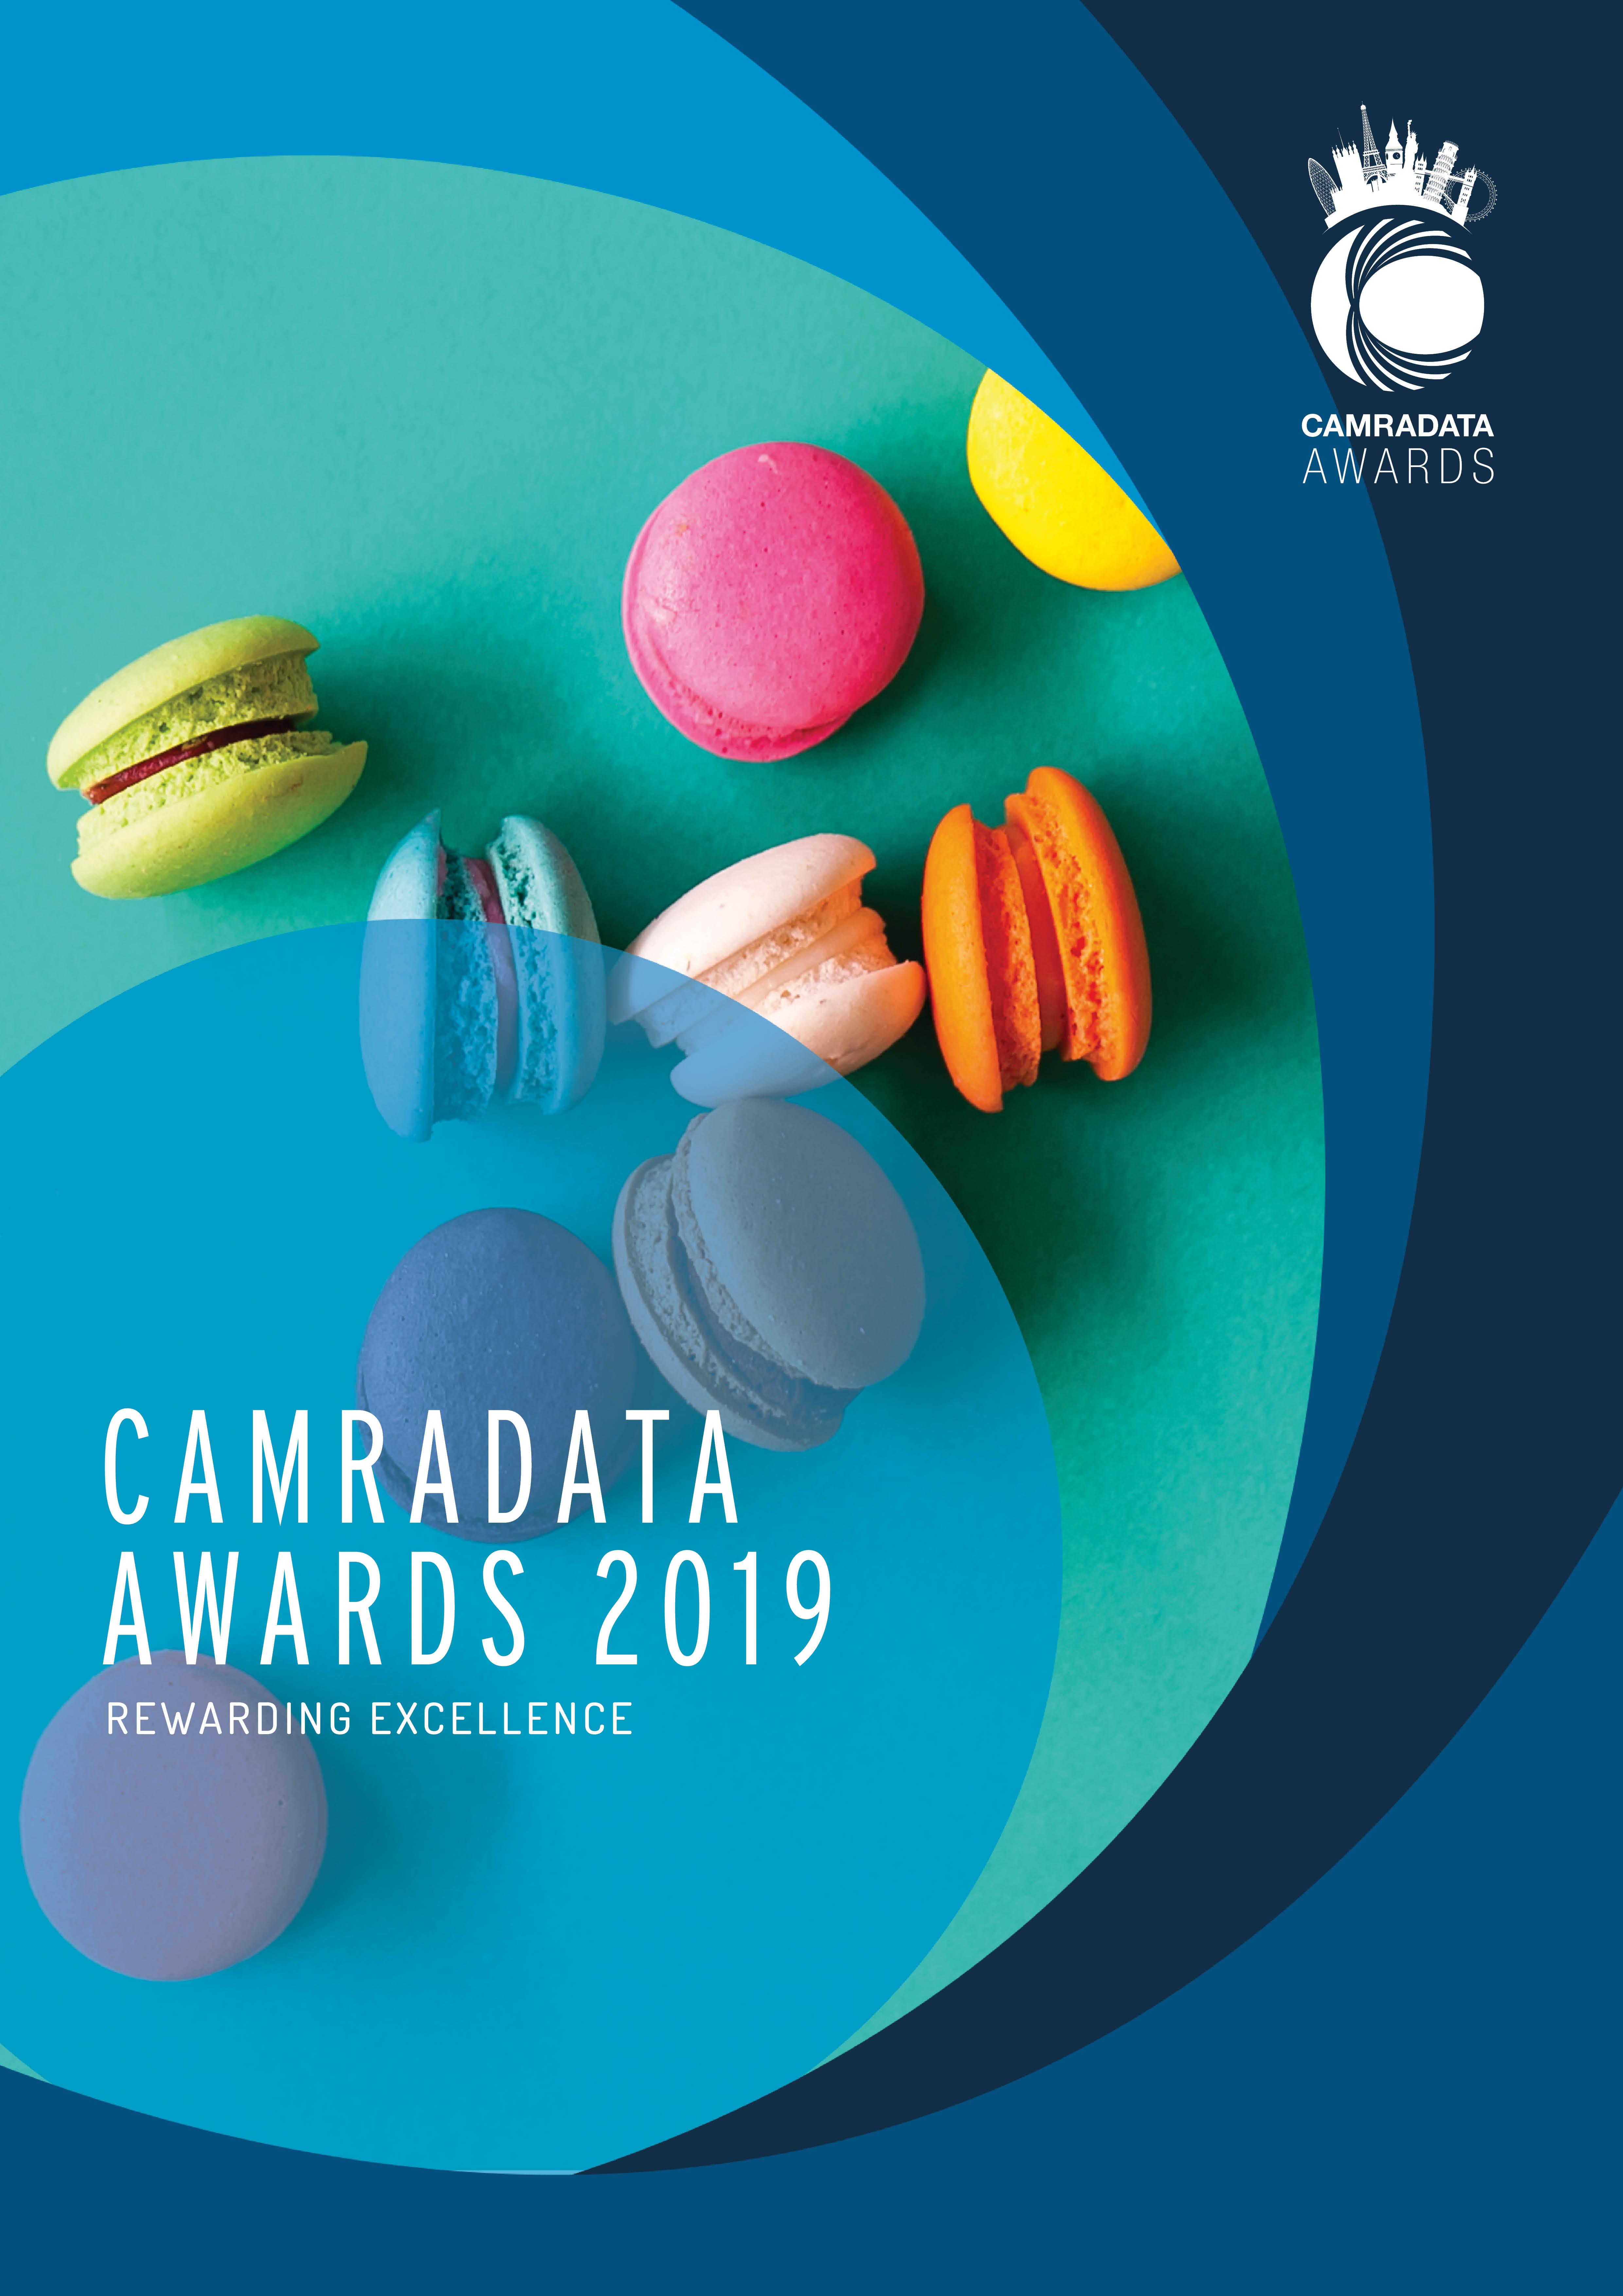 CAMRADATA Awards 2019